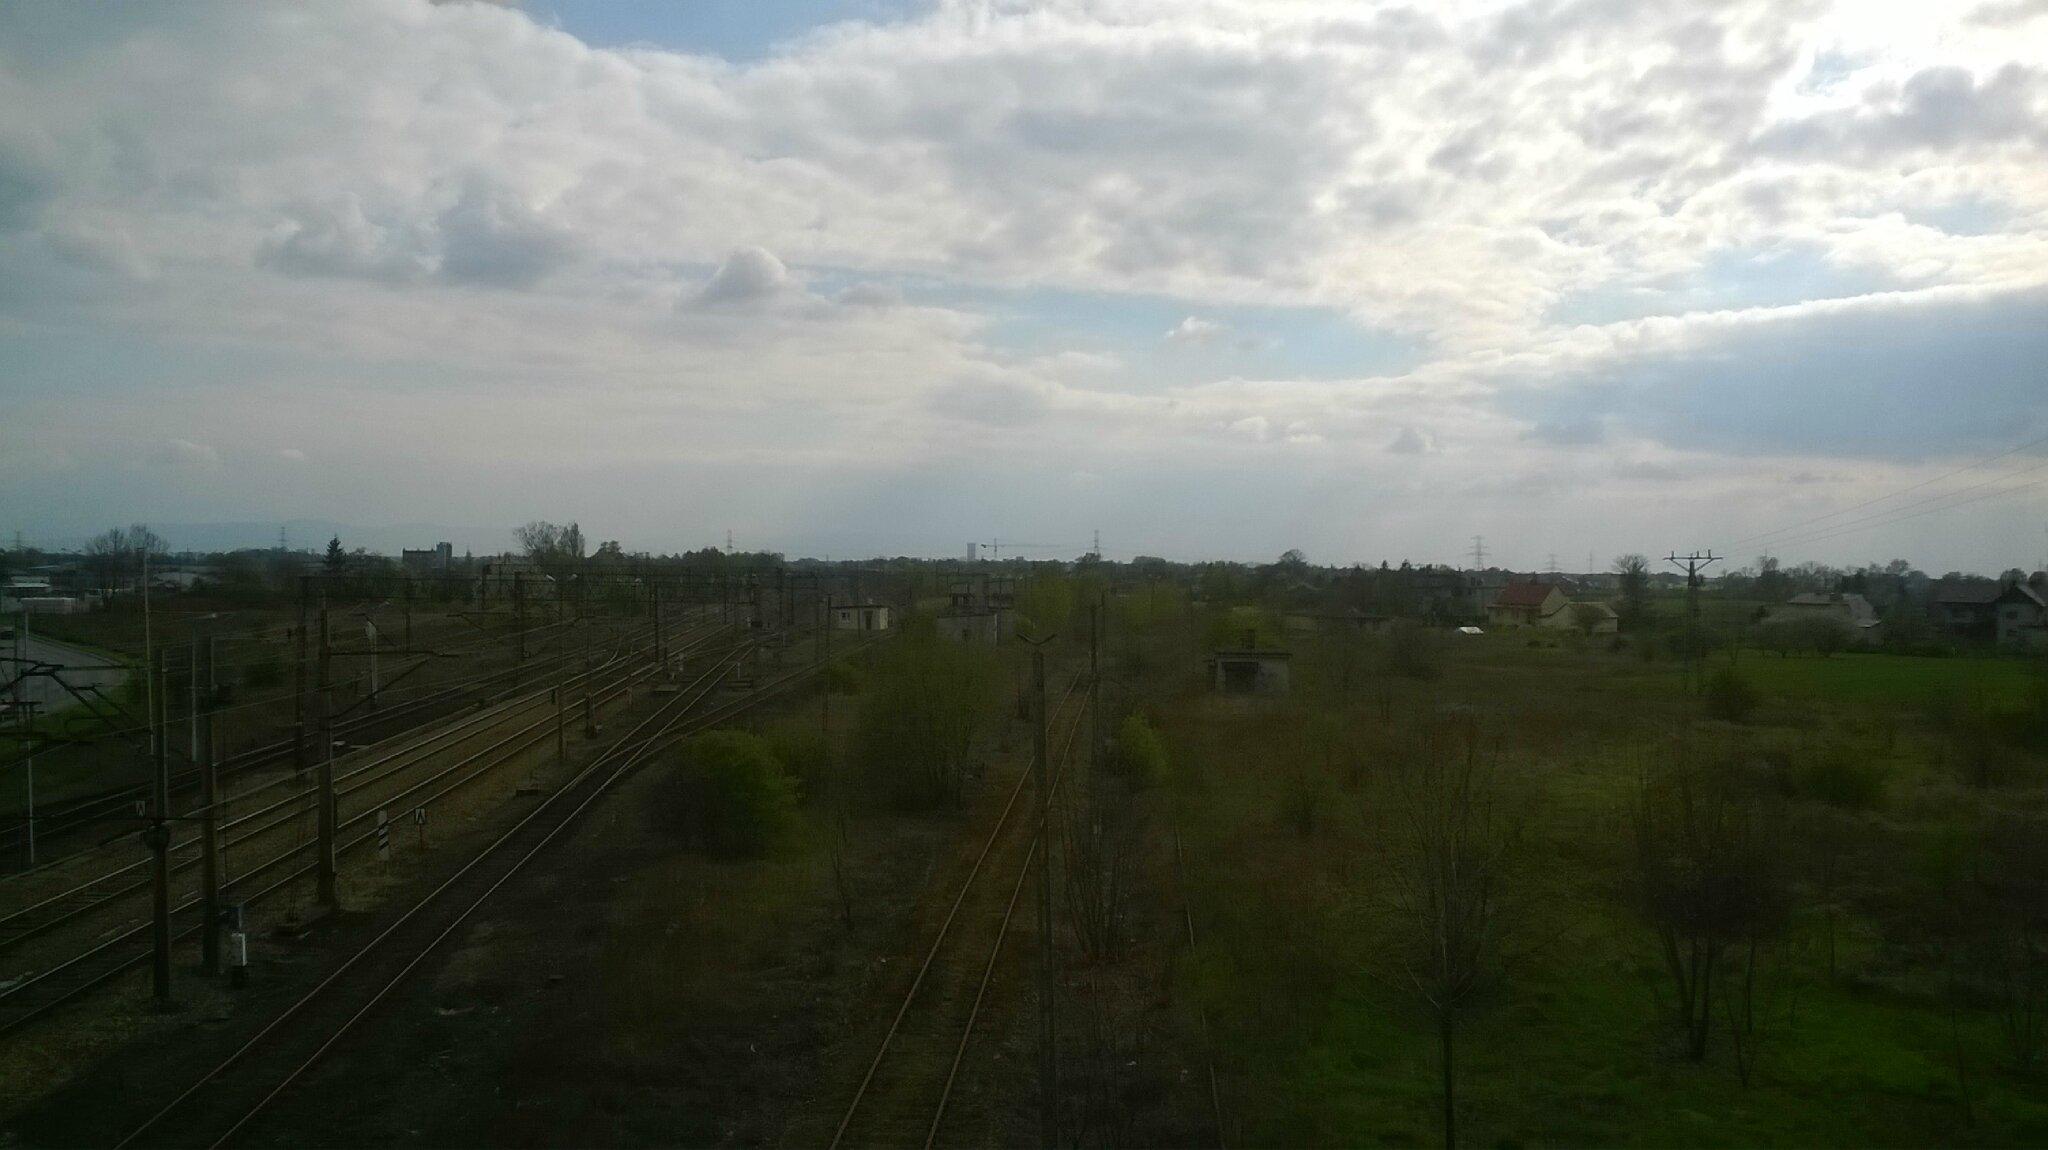 Auschwitz (Pologne) Poste Bifurcation pour Birkenau